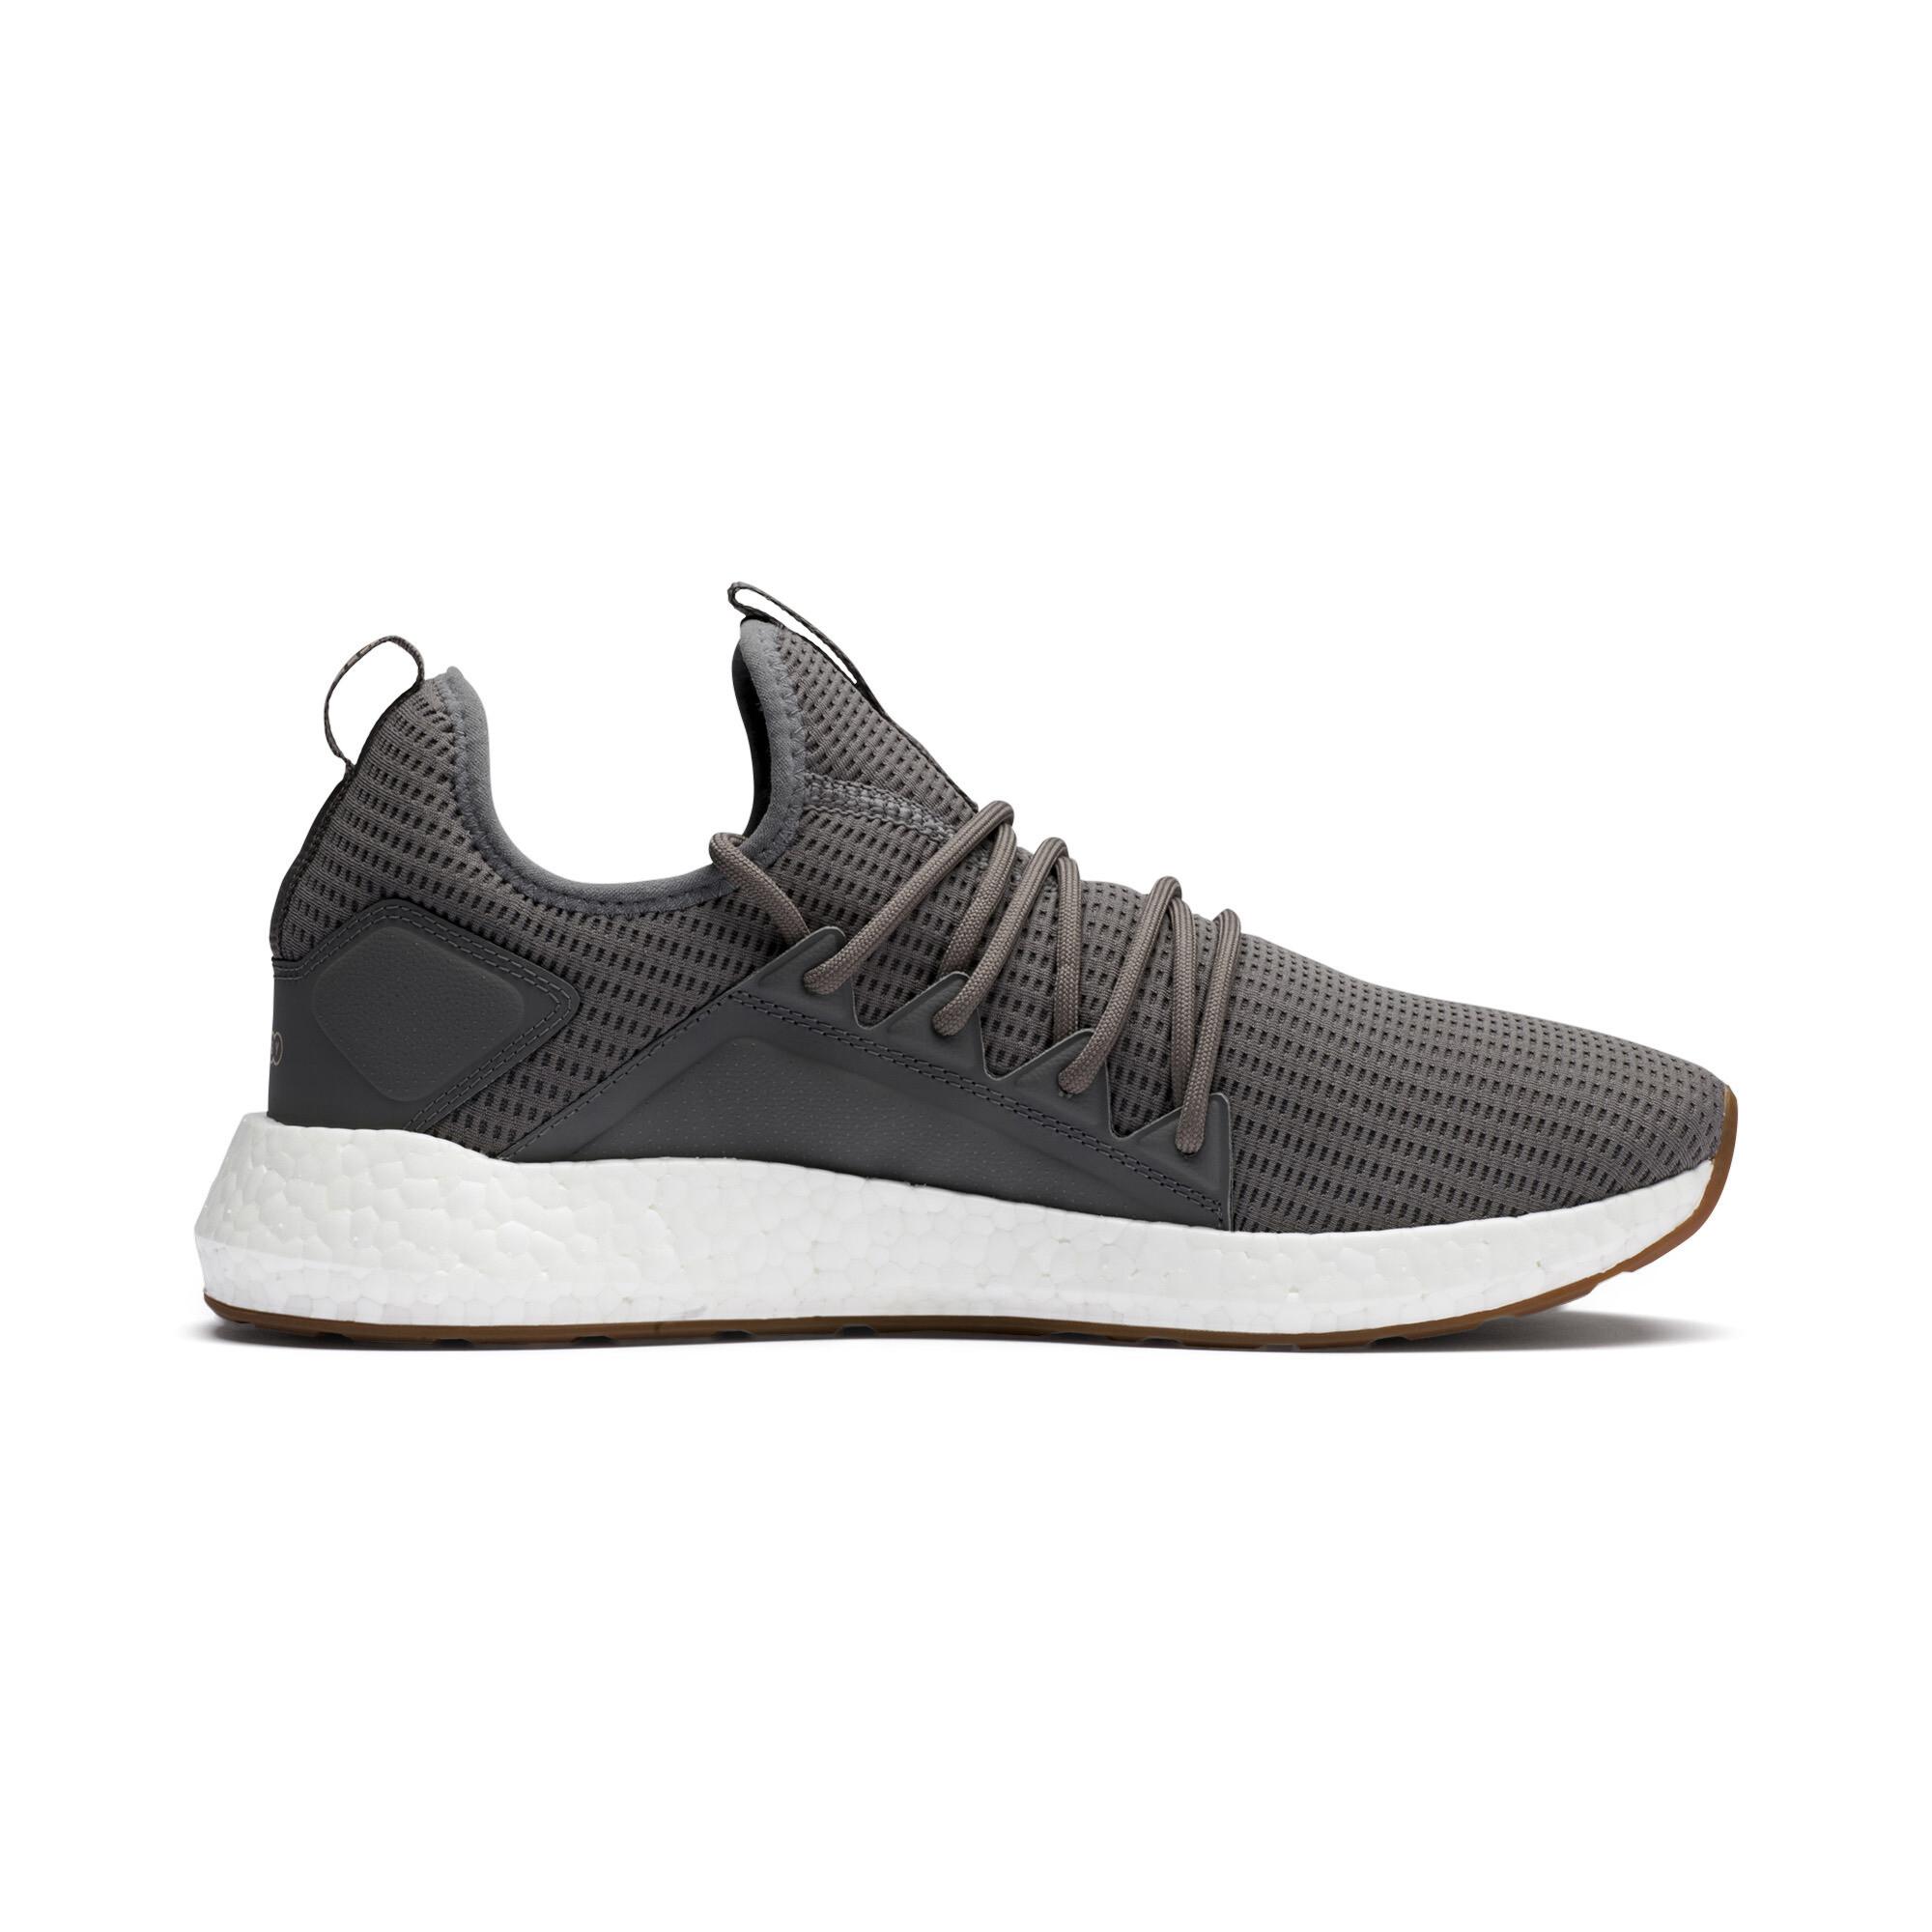 PUMA-NRGY-Neko-Future-Men-s-Running-Shoes-Men-Shoe-Running thumbnail 12